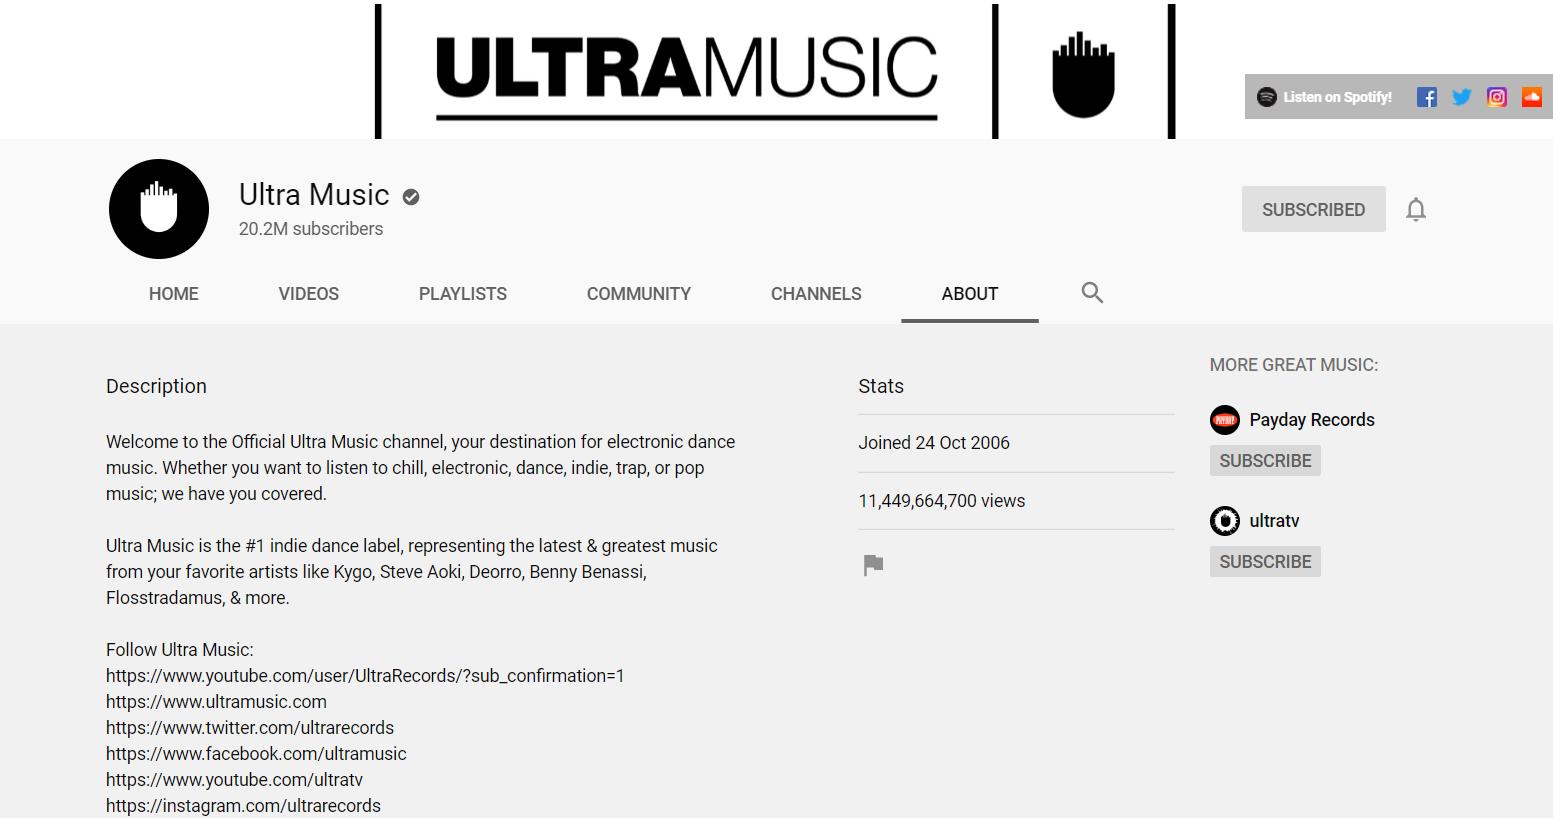 ultramusic